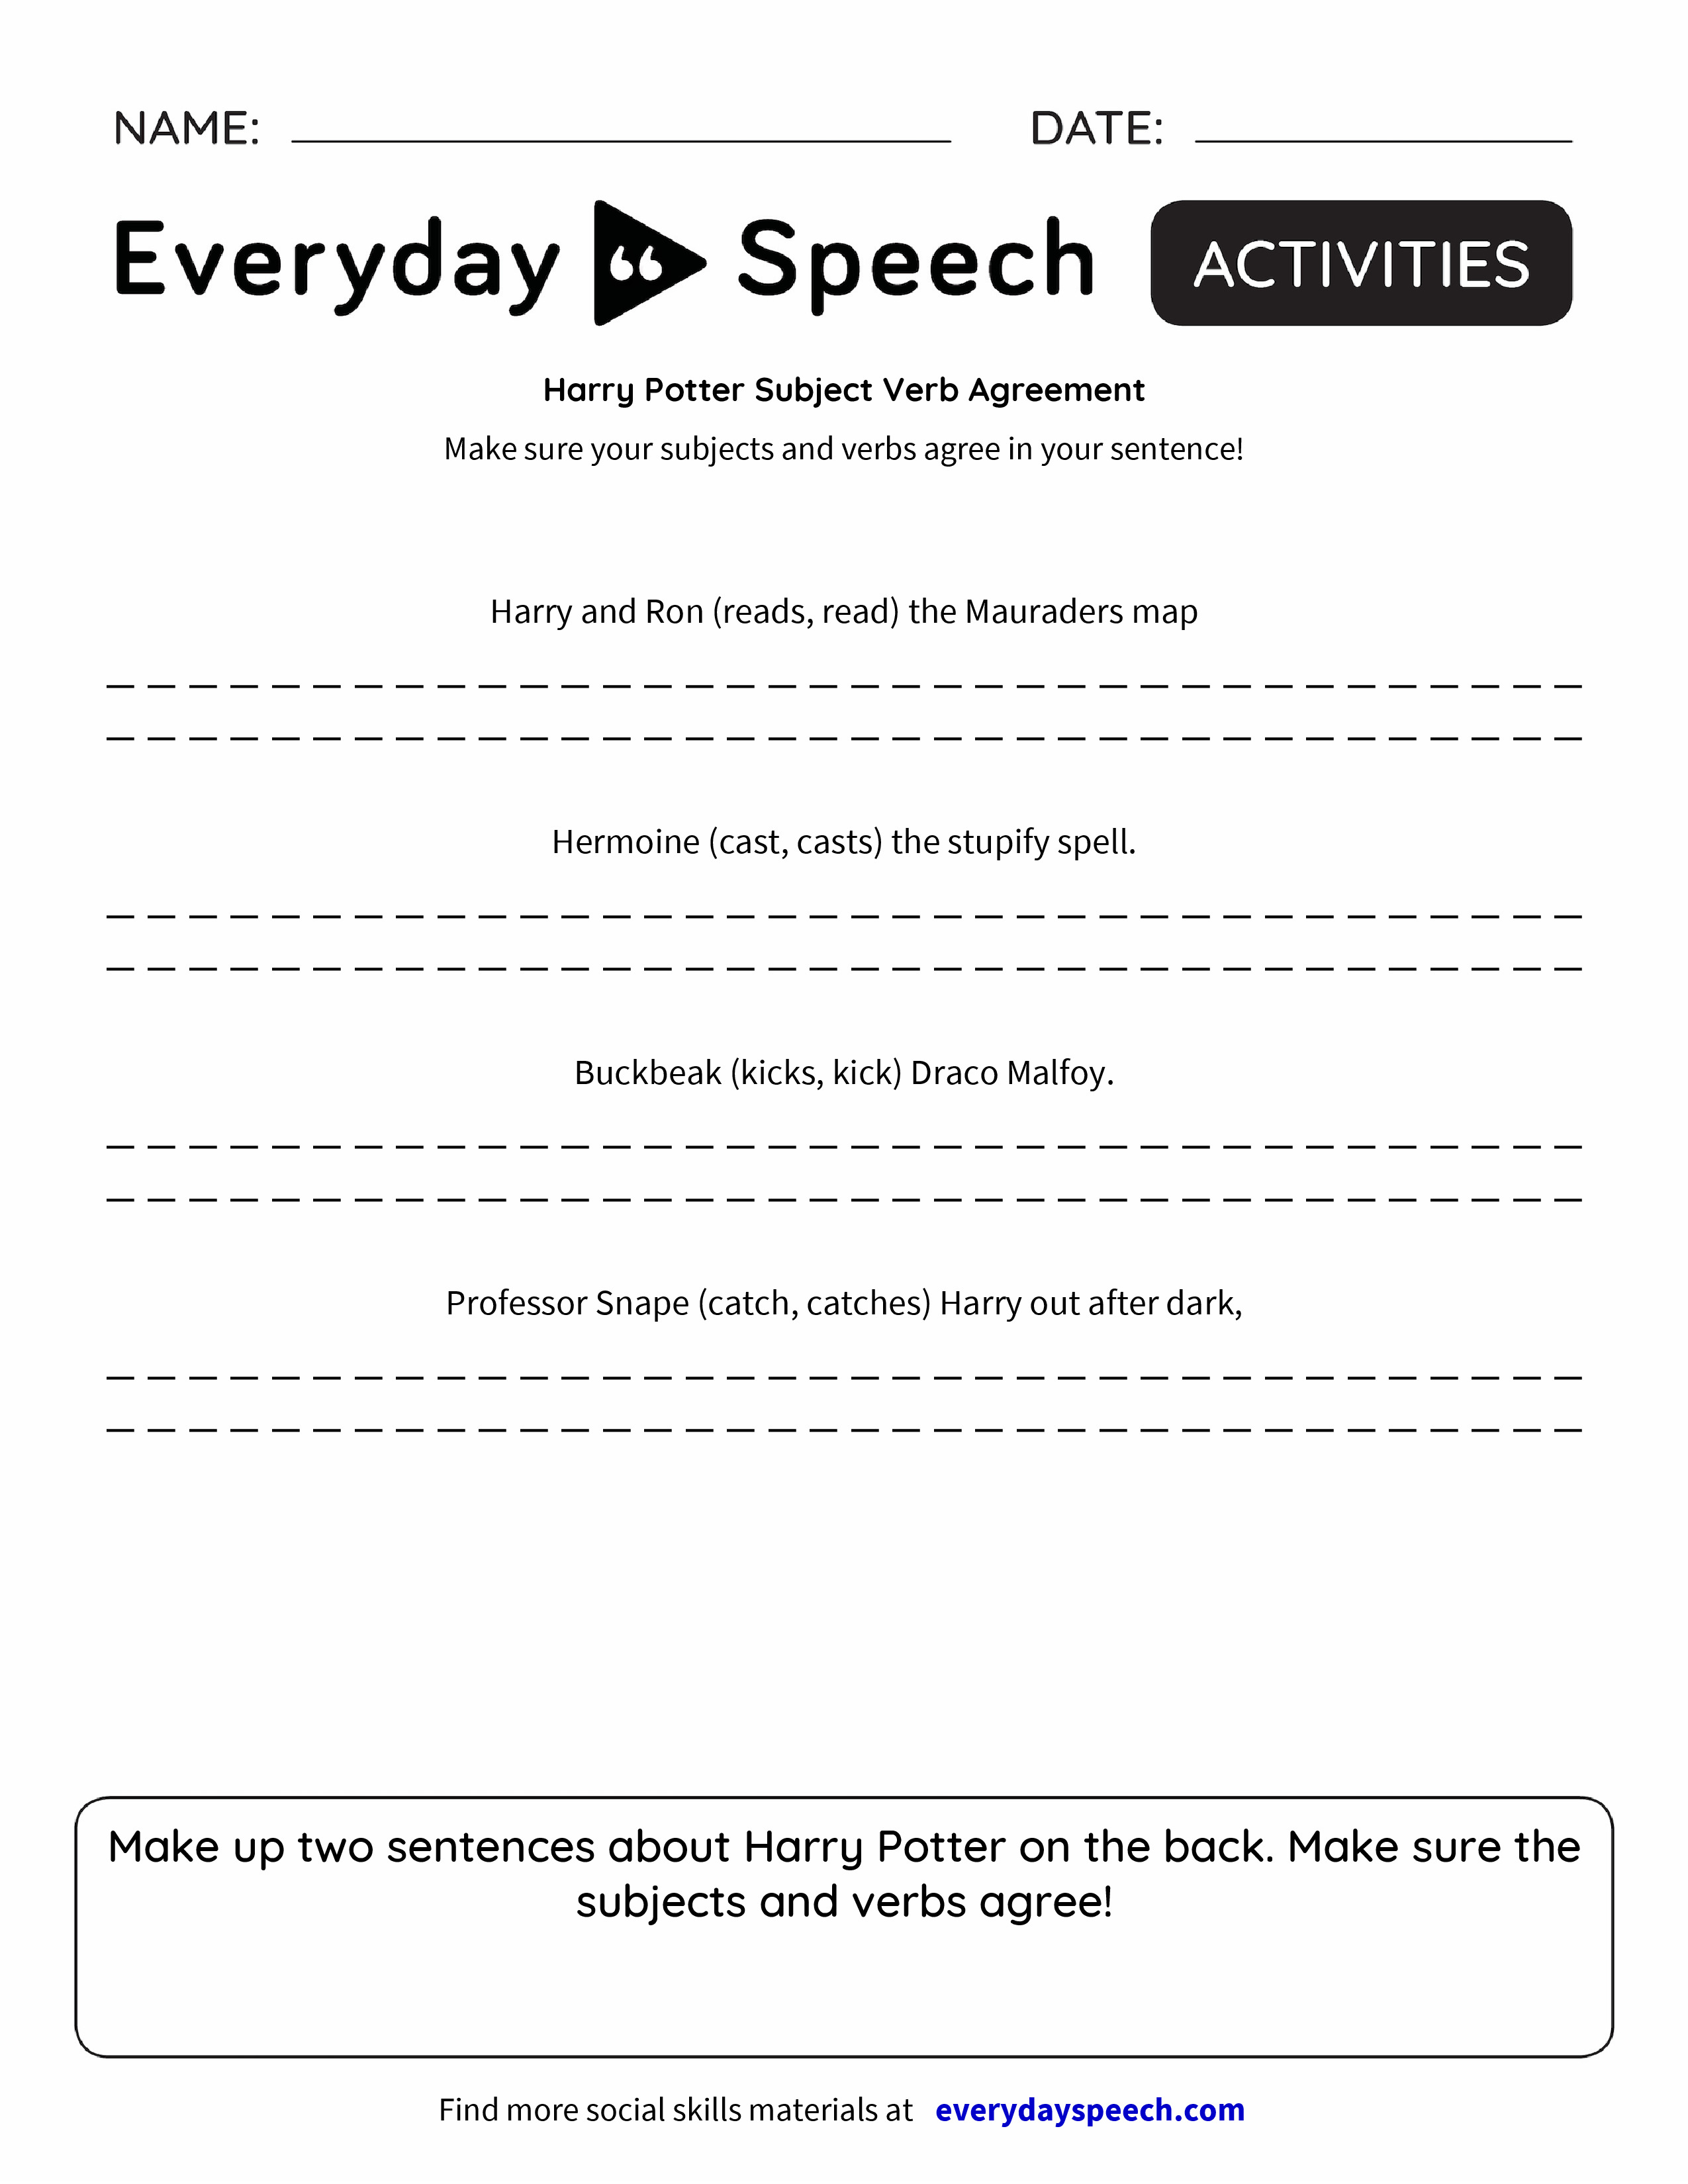 Harry Potter Subject Verb Agreement Everyday Speech Everyday Speech